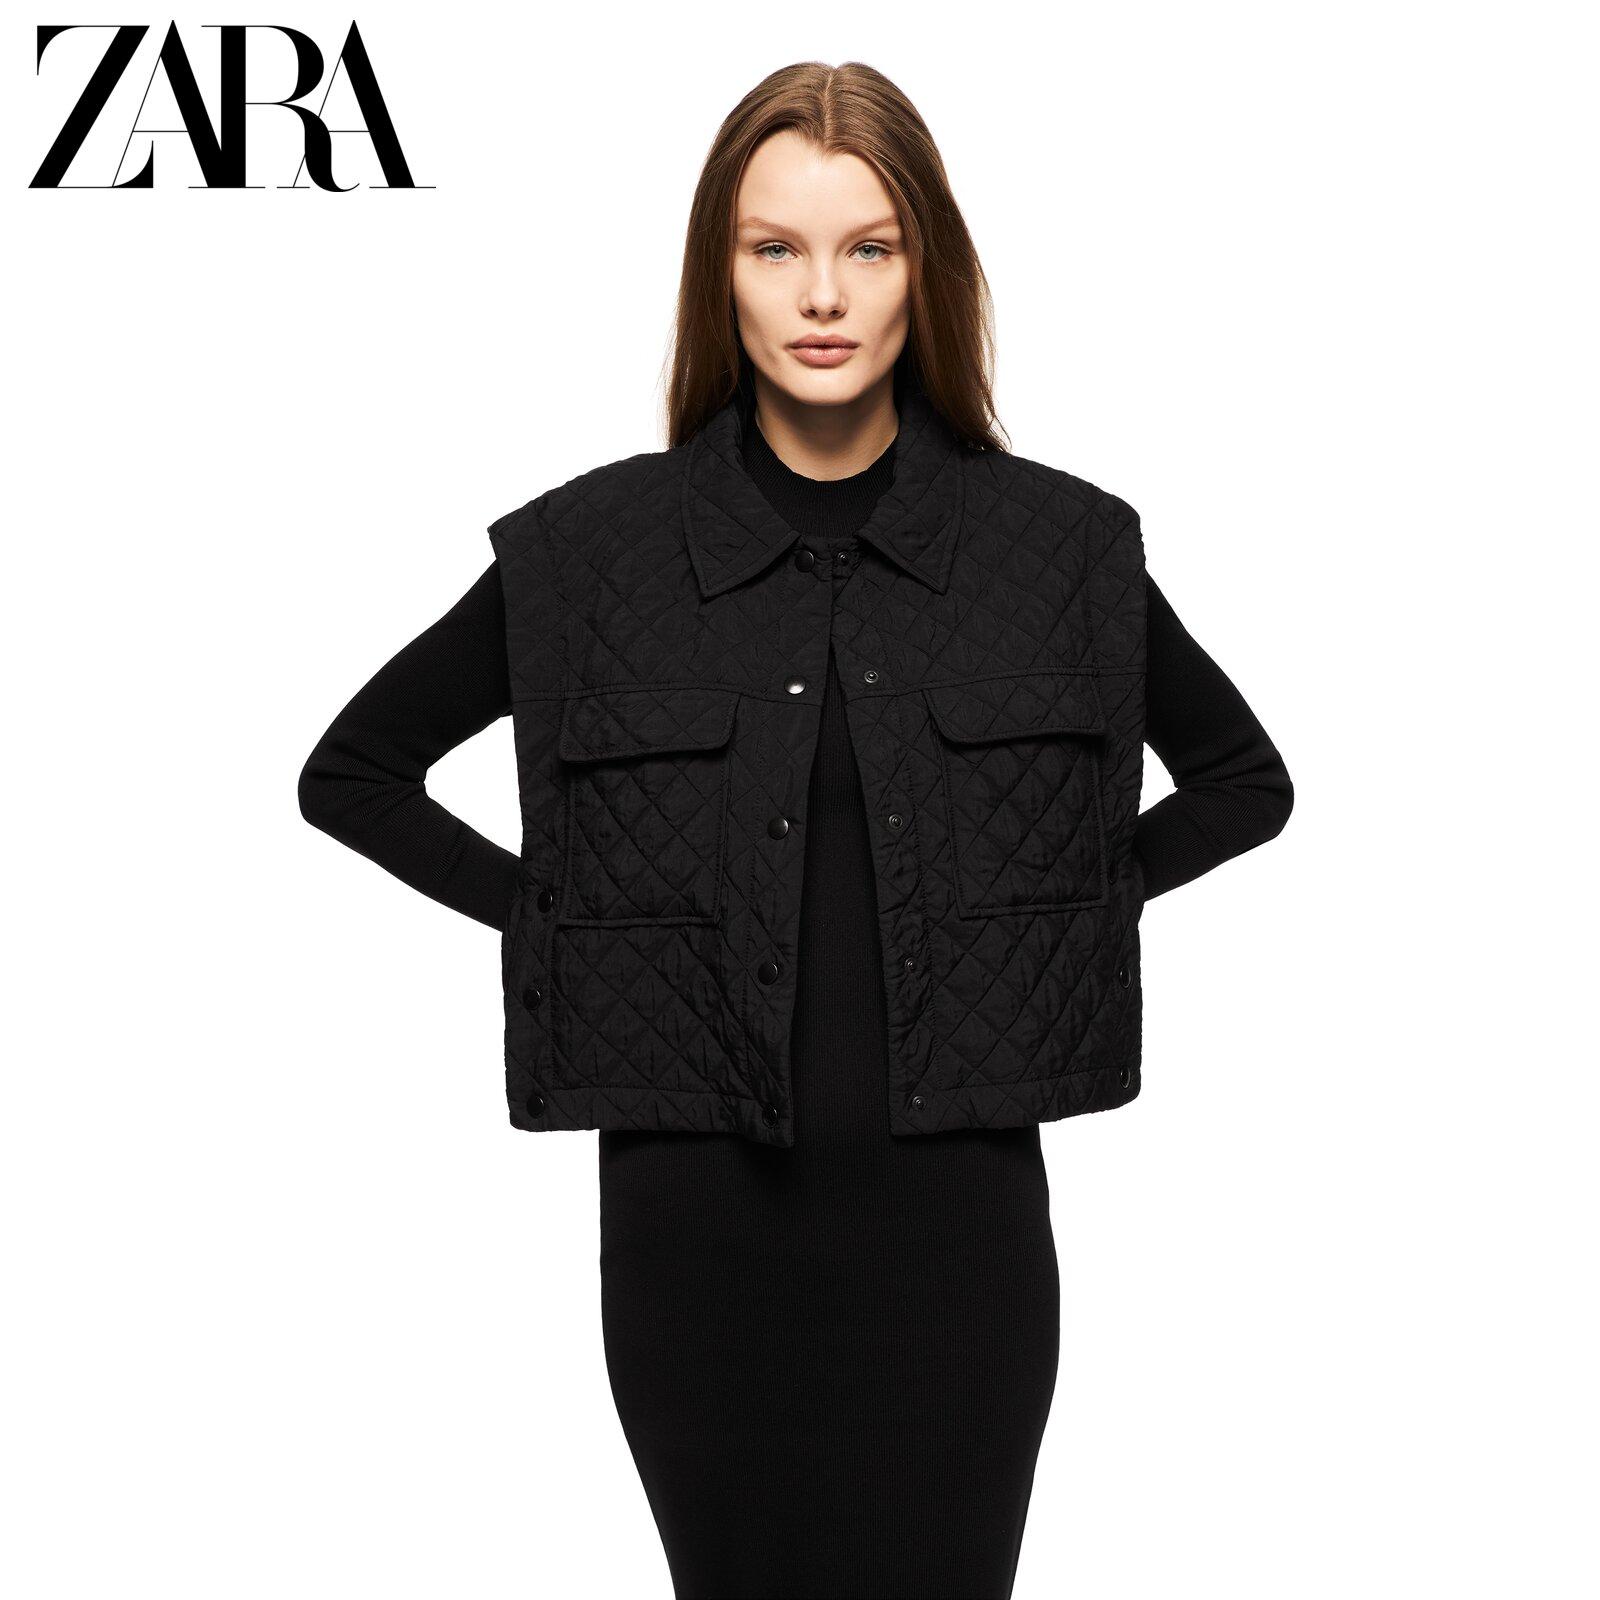 ZARA new womens quilted short vest 04886048800